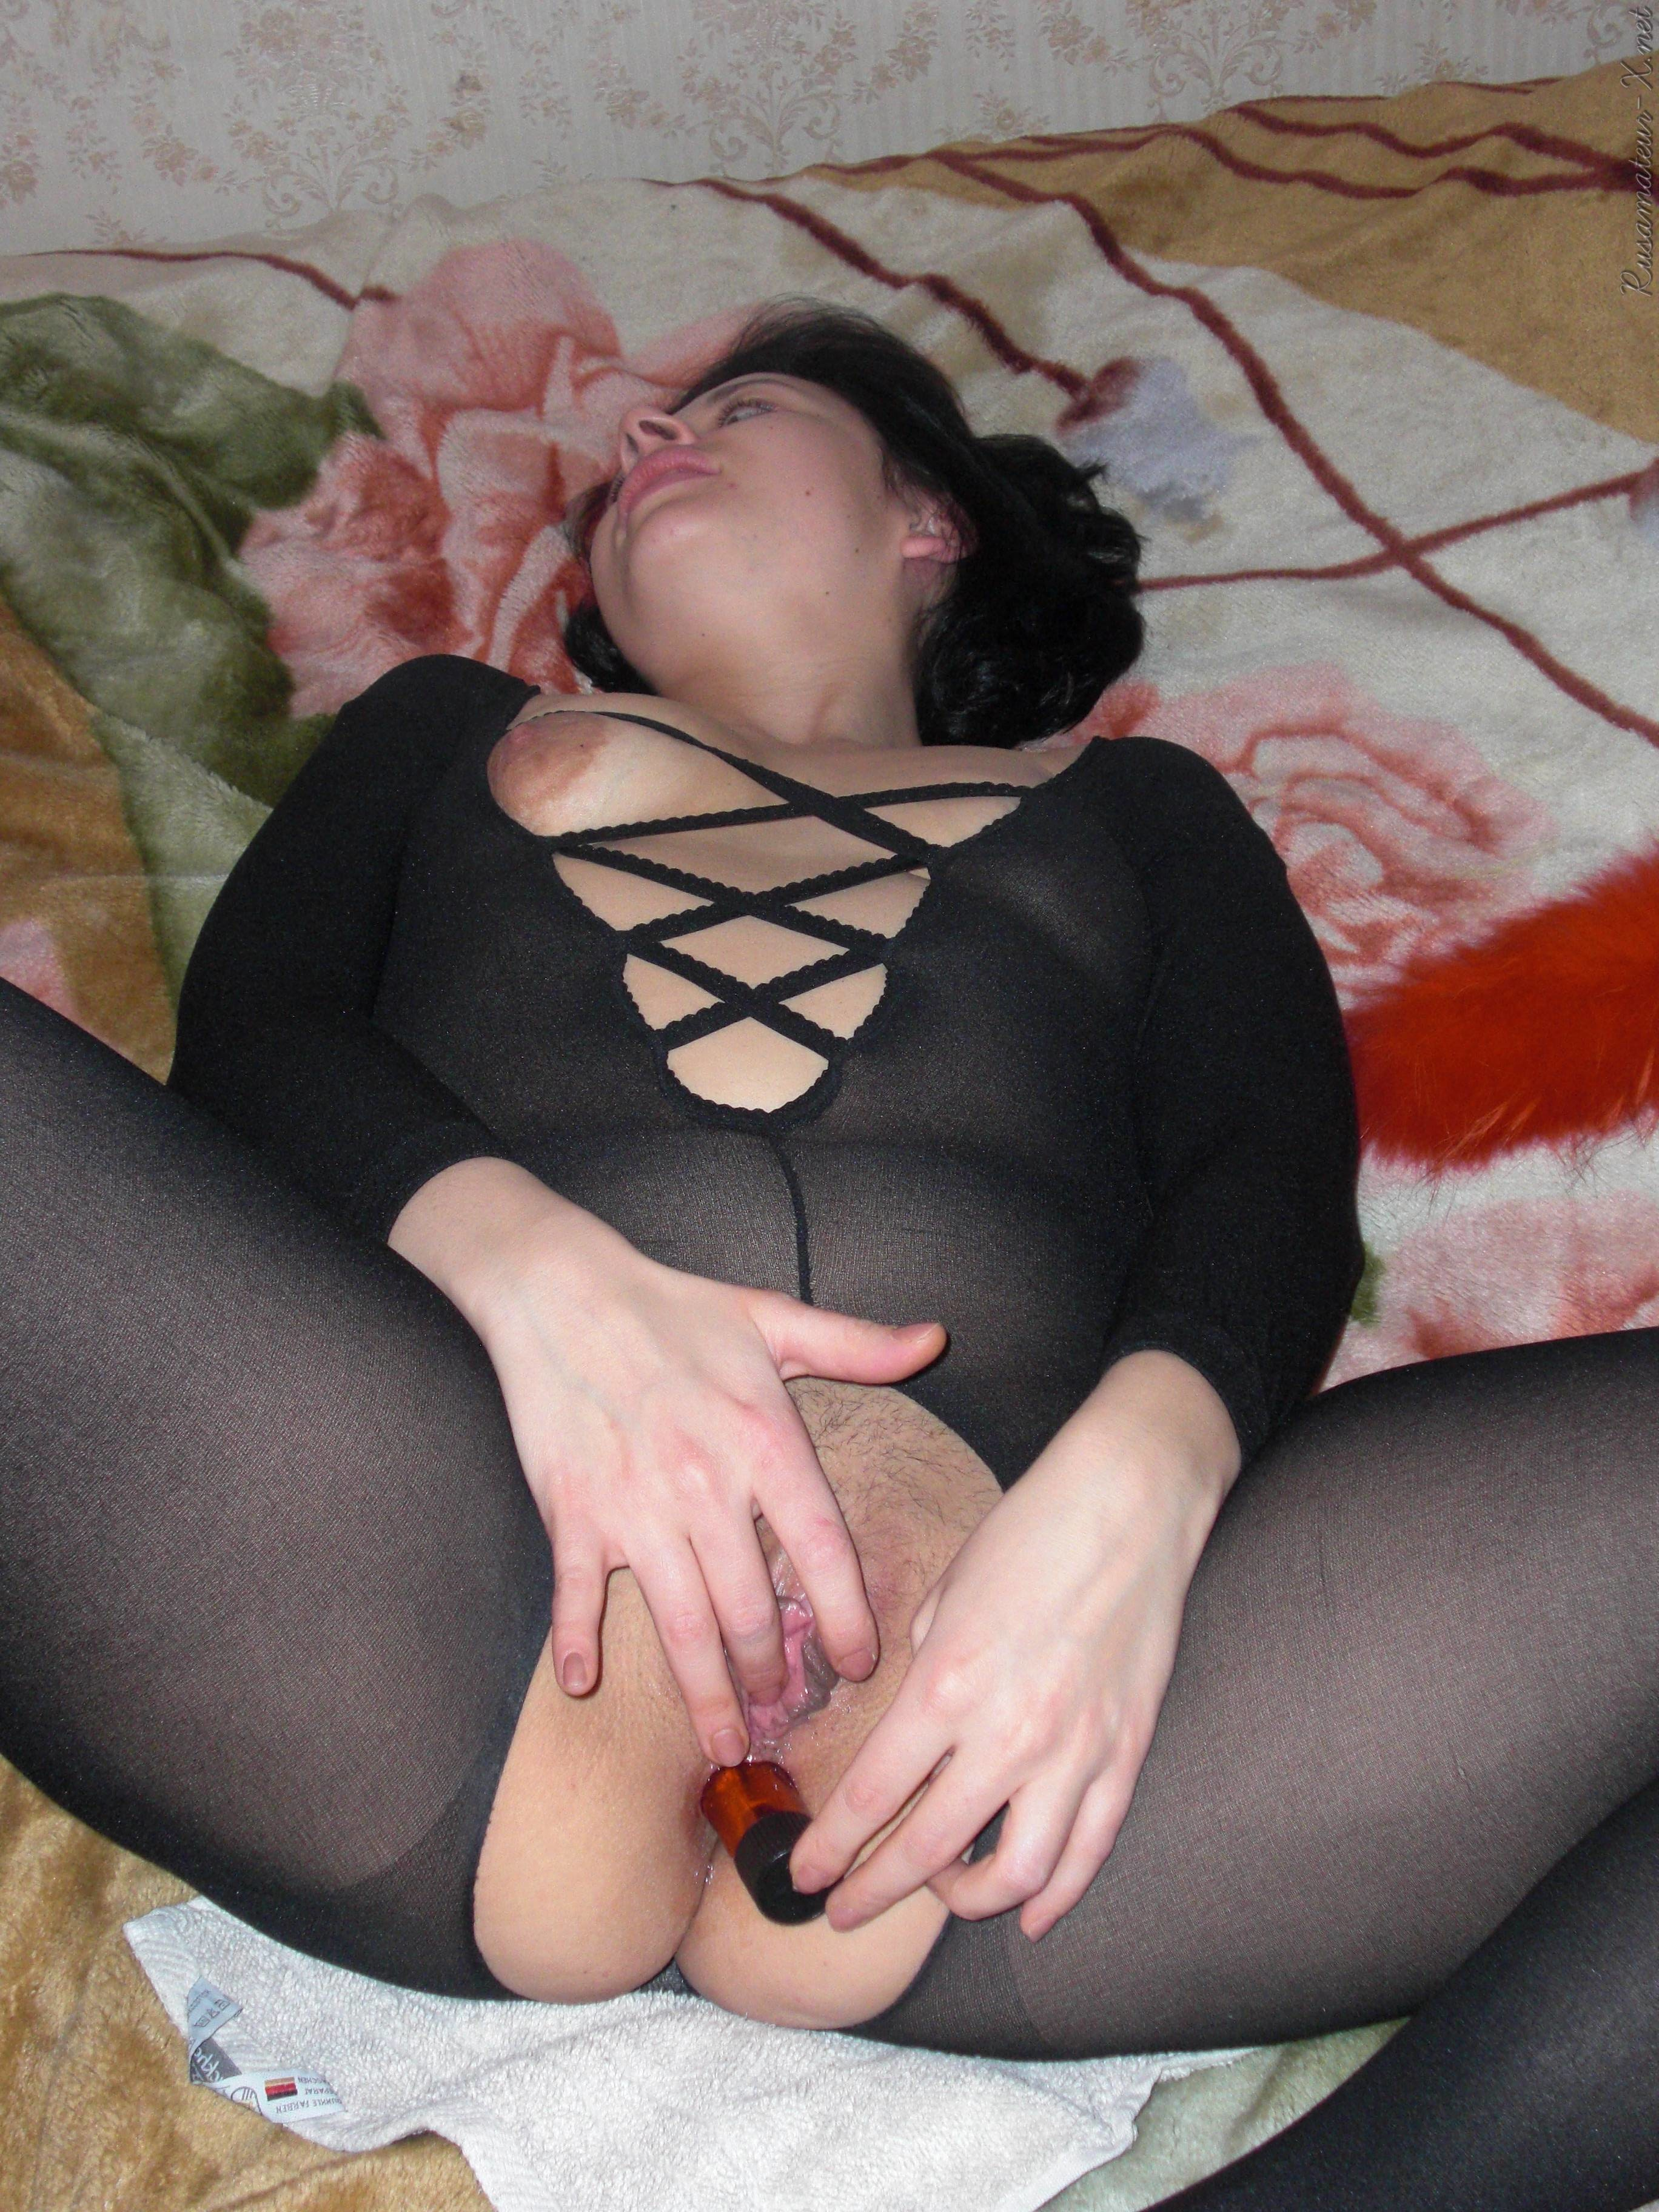 foto-s-zhen-v-naryadah-porno